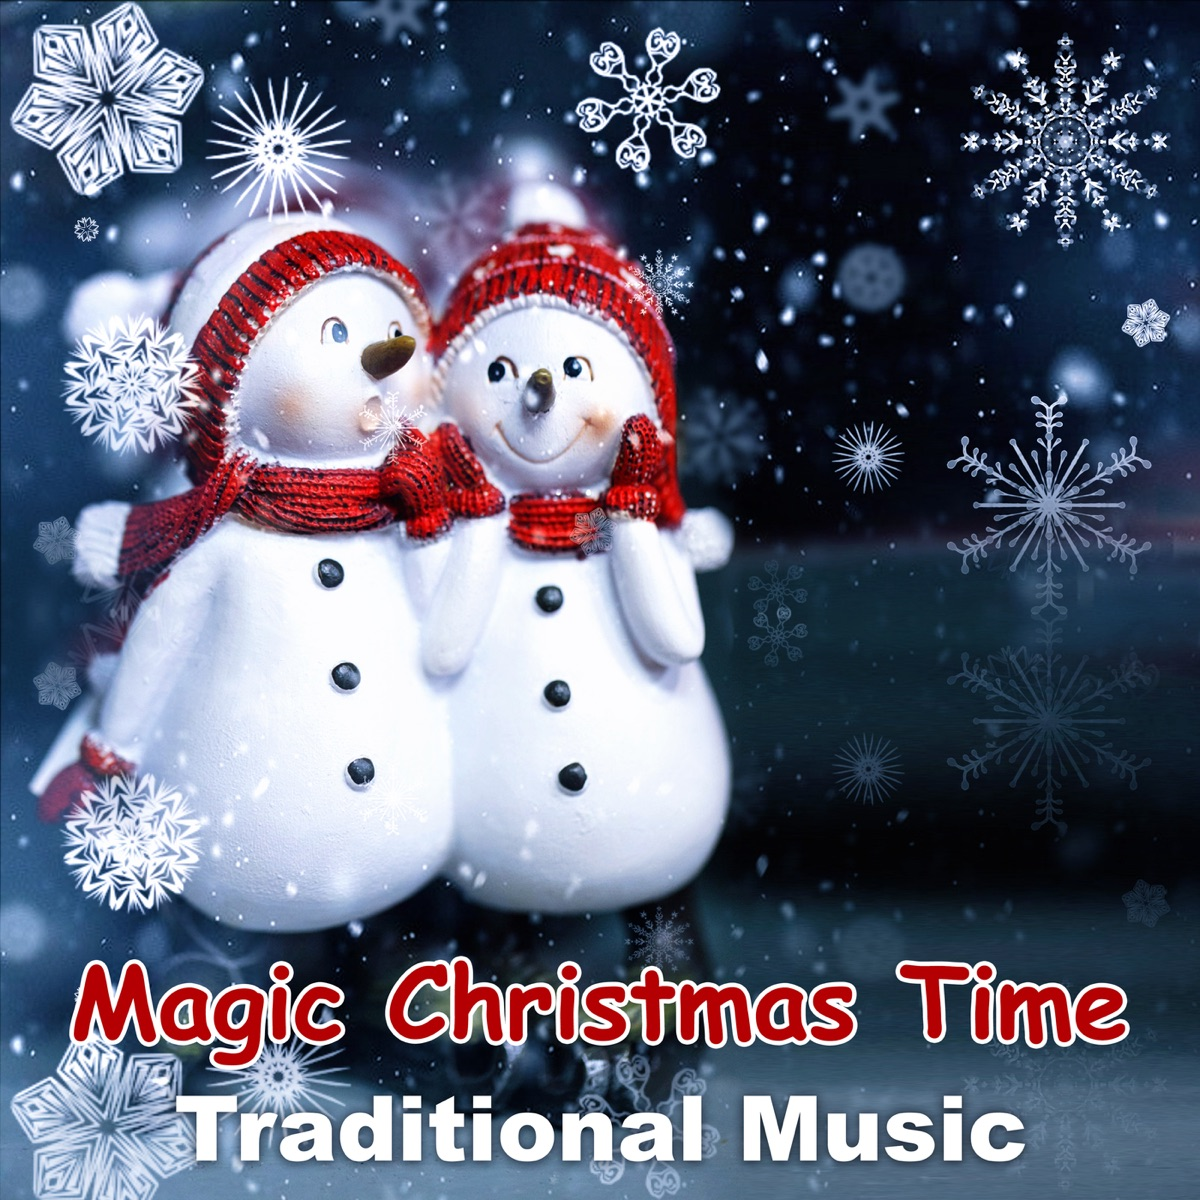 popular carols christmas songs 20 traditional favourite christmas carols calming instrumental music xmas holidays happy christmas